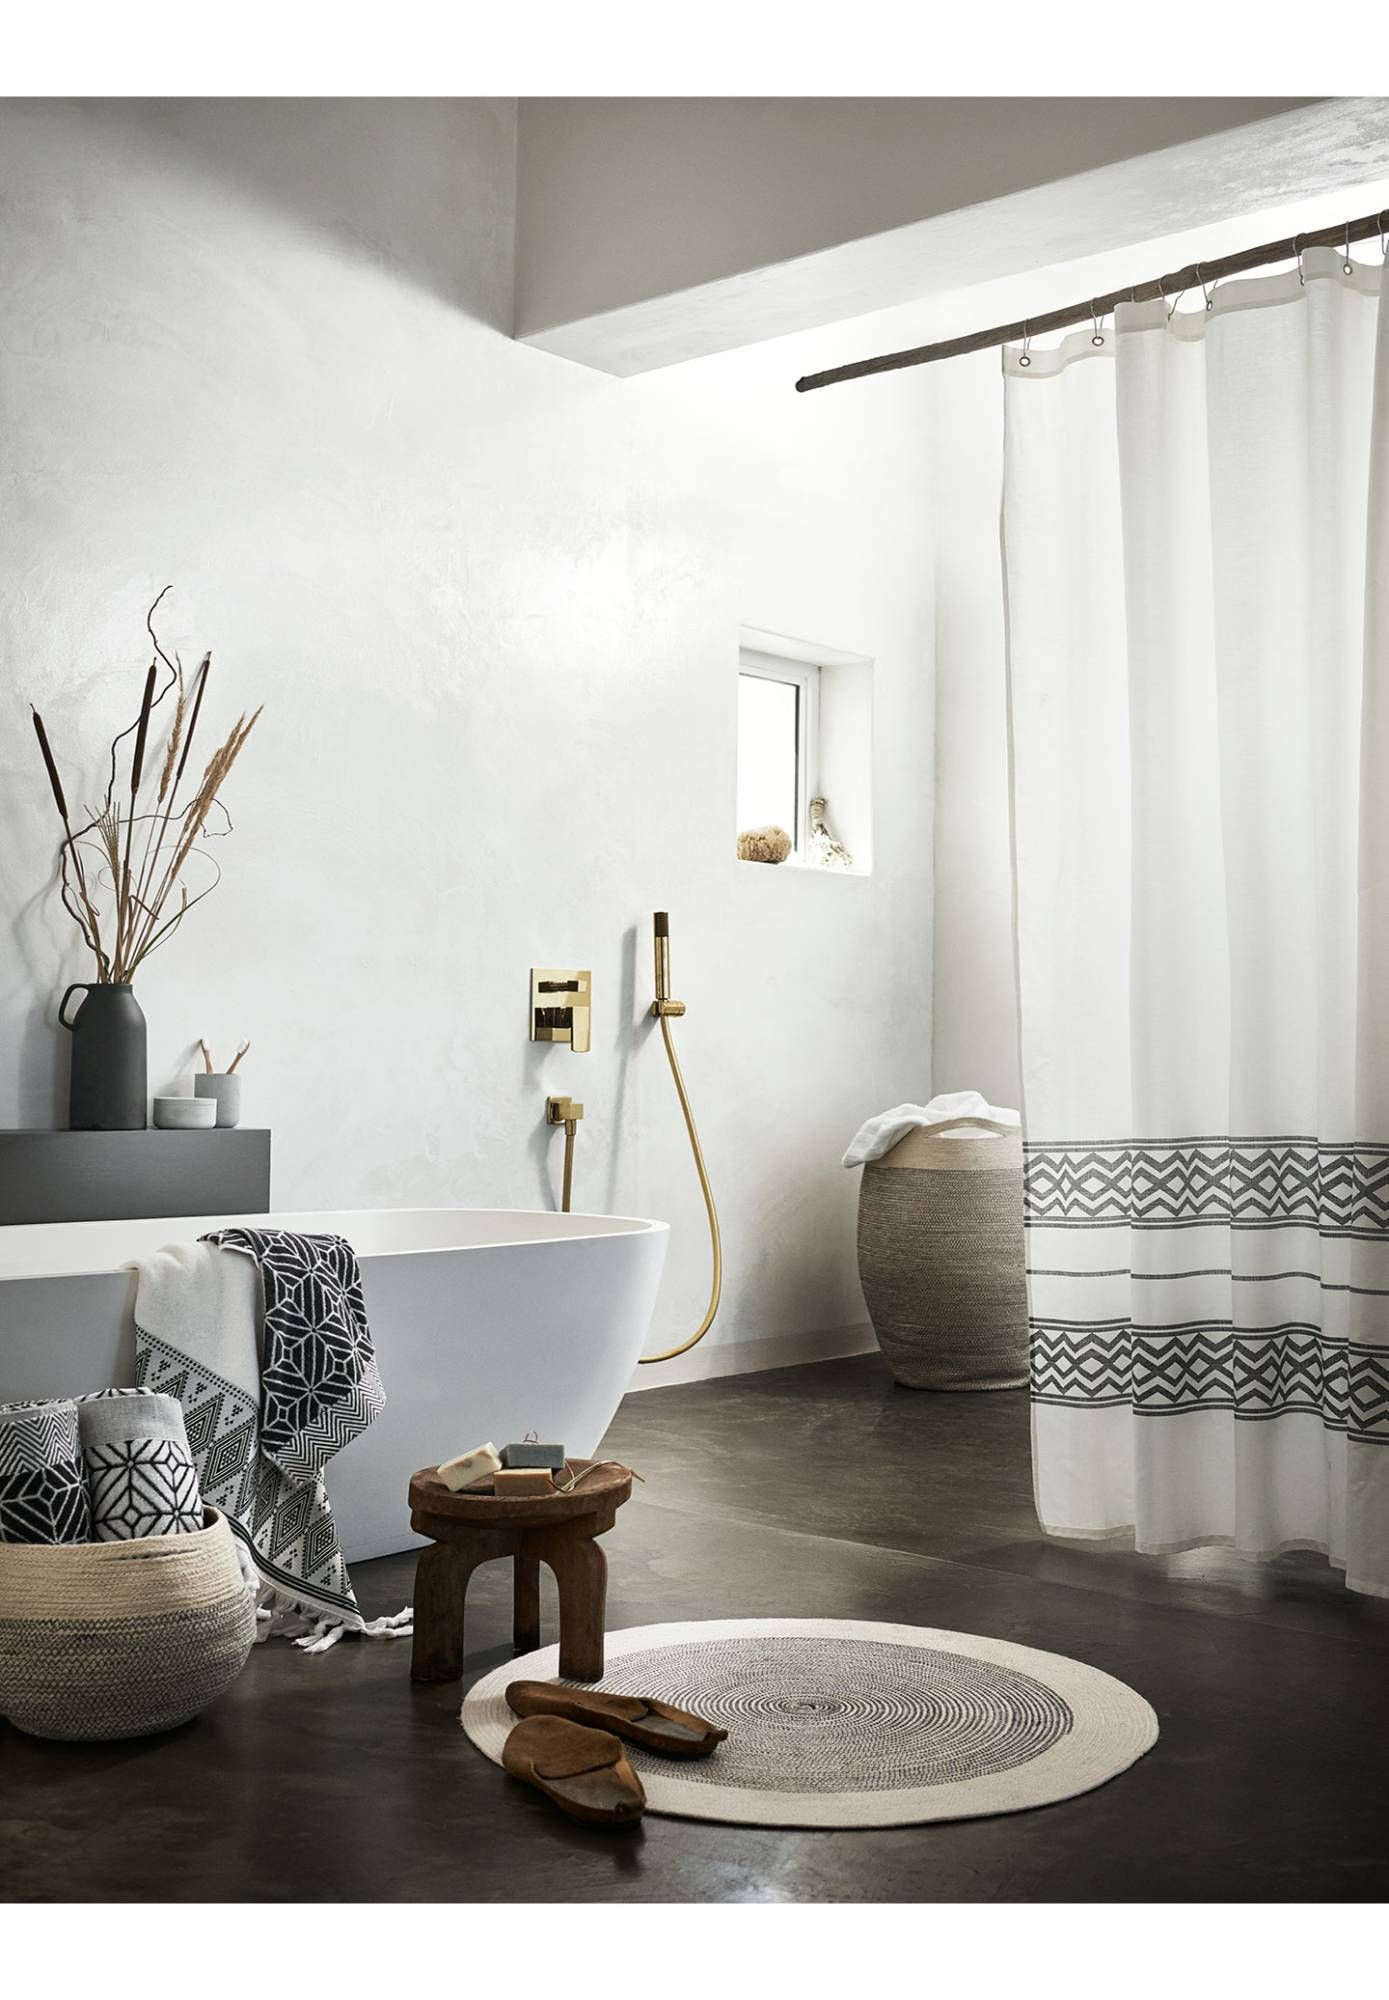 Plafonnier Salle De Bain Brico Depot ~ H M Home Inspo Bathroom Pinterest